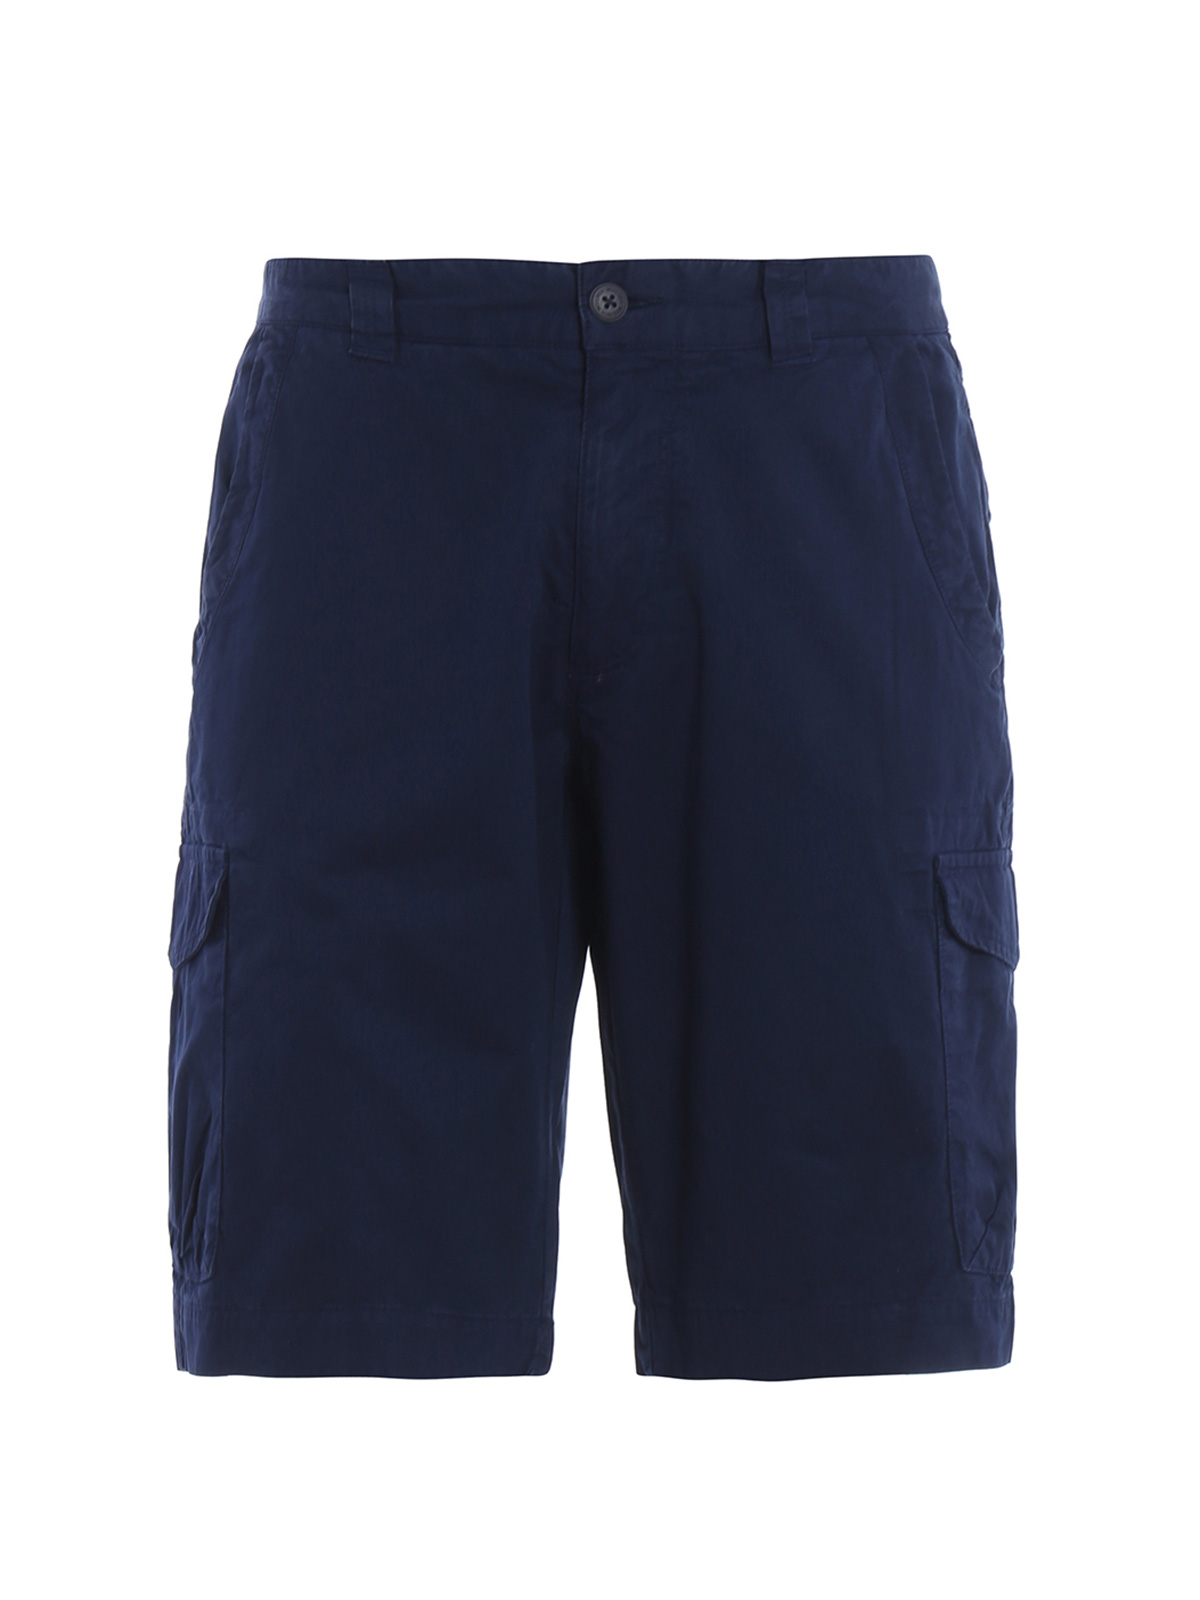 Picture of WOOLRICH | Men's Short Cargo Pants